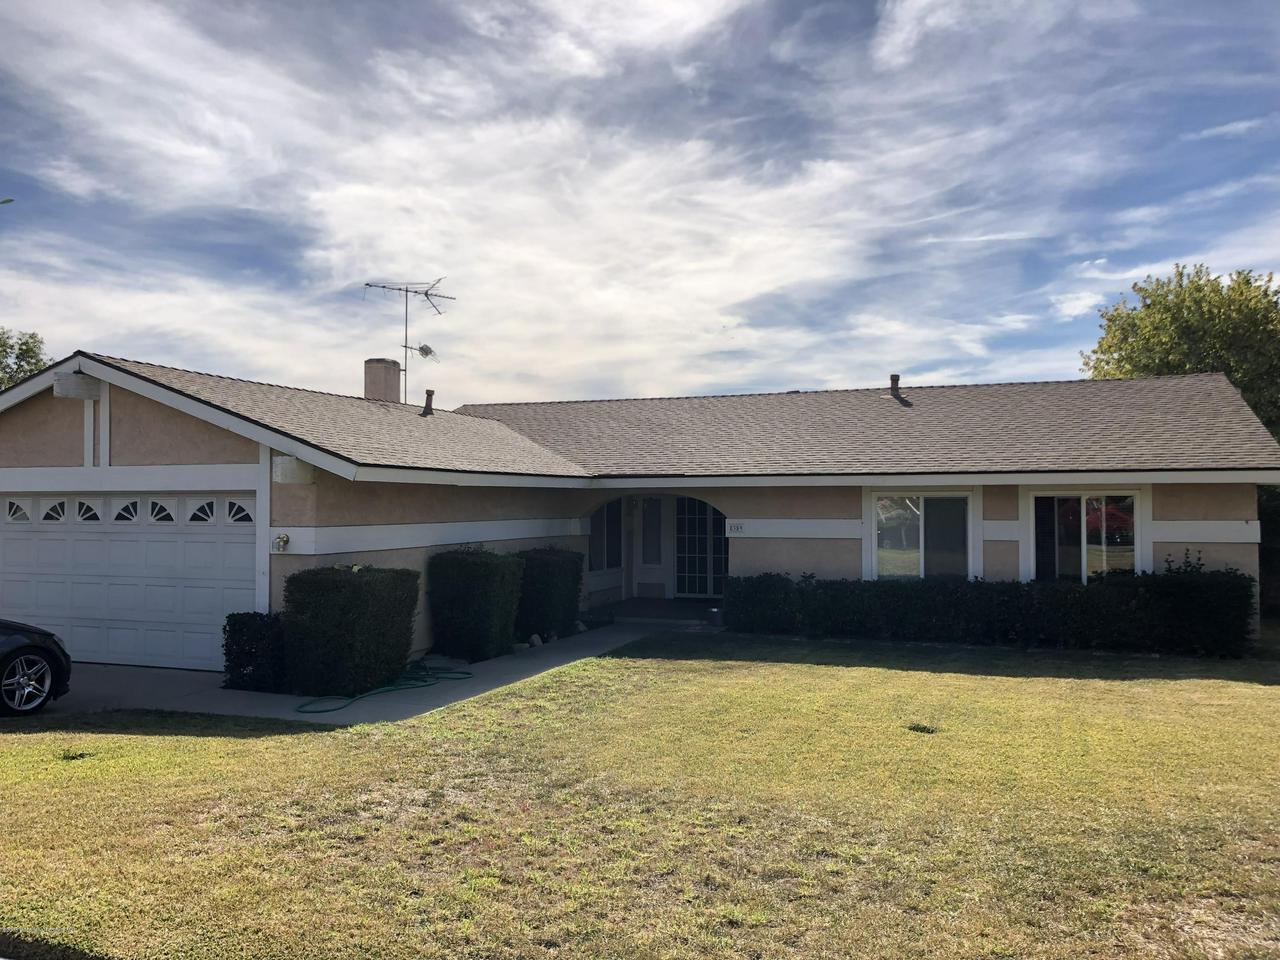 8359 GARDEN, Rancho Cucamonga, CA 91701 - IMG_5503